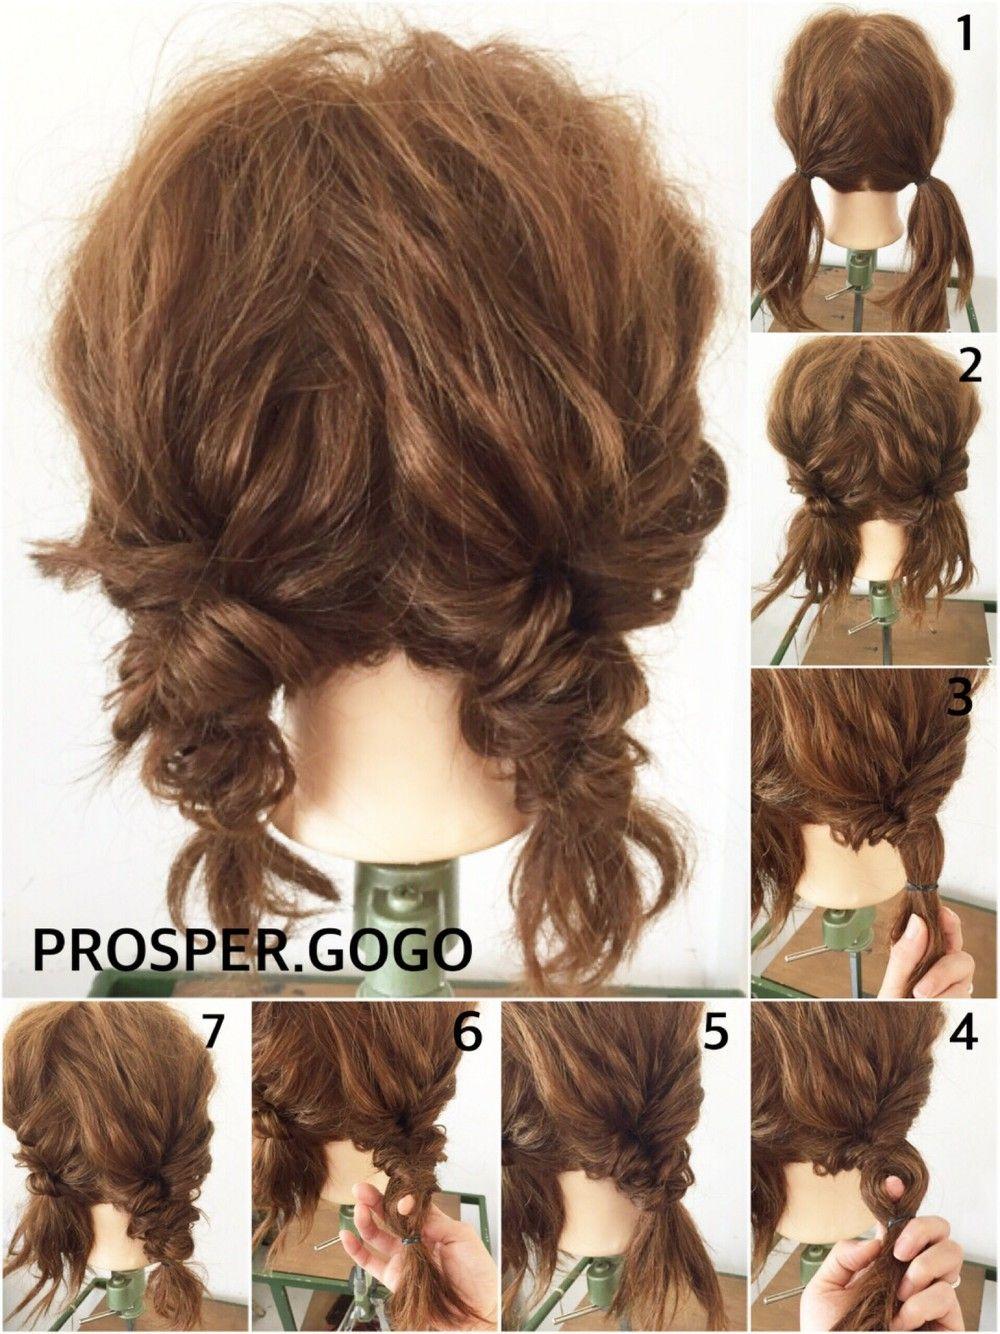 Braid color combo inspiration for summer hair style hair arrange